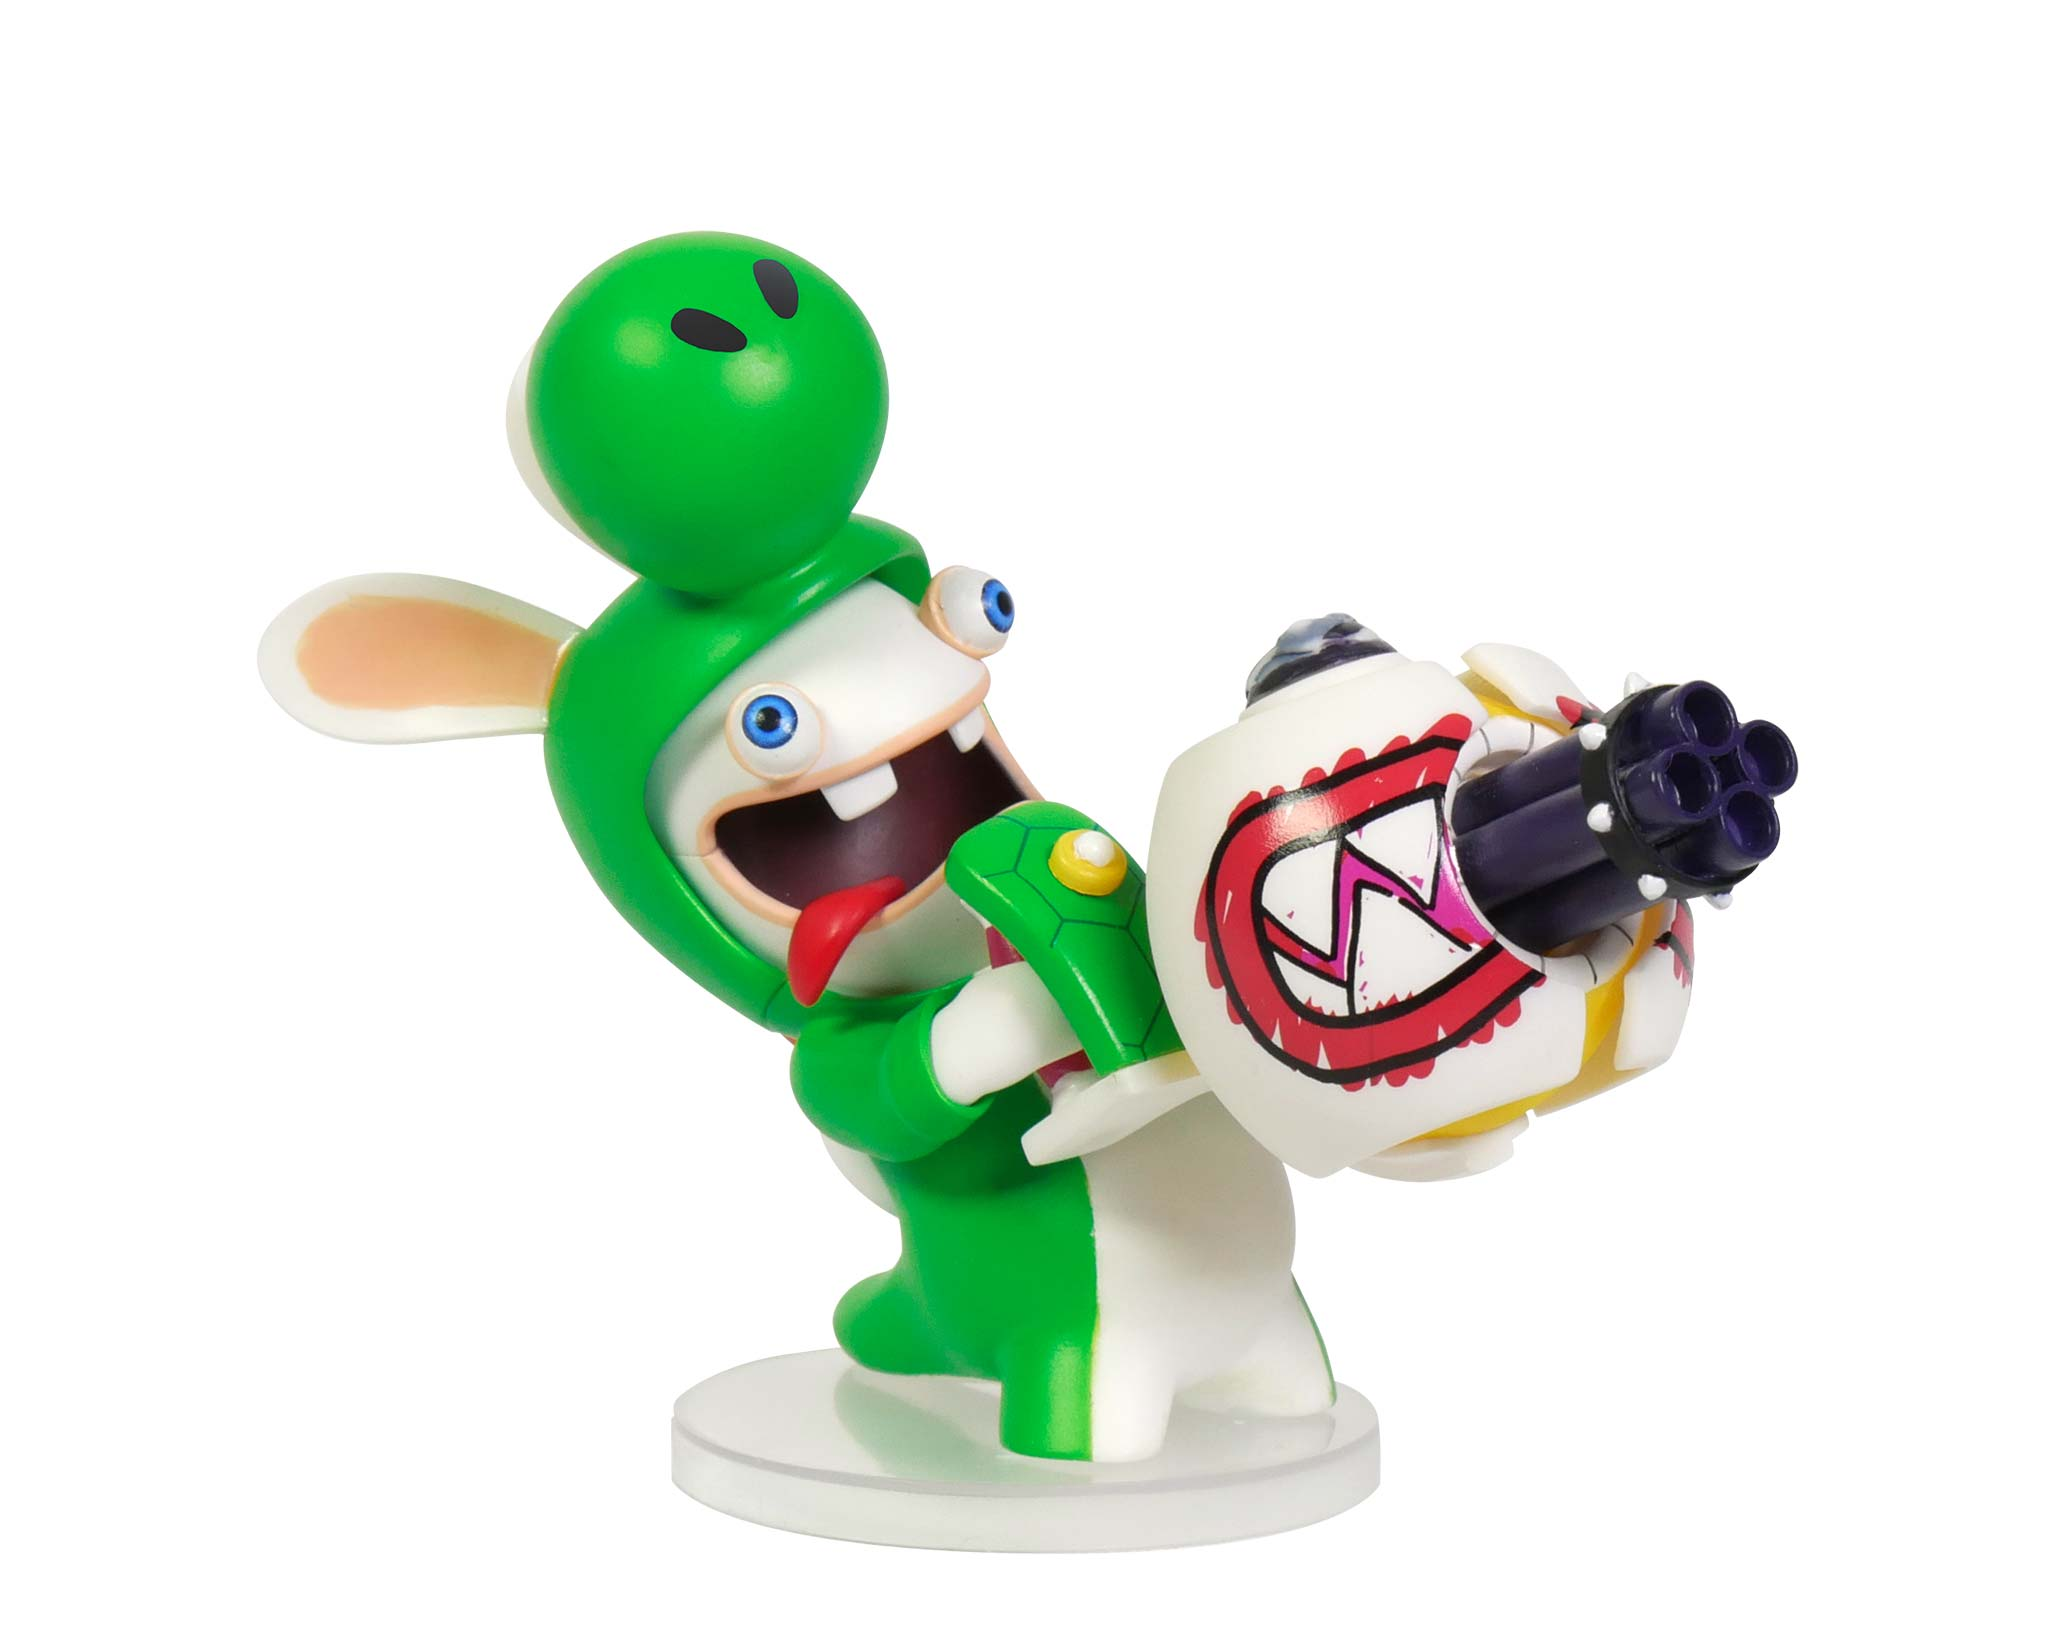 Yoshi 3 Figurine  Mario  Rabbids Kingdom Battle  Ubi Workshop